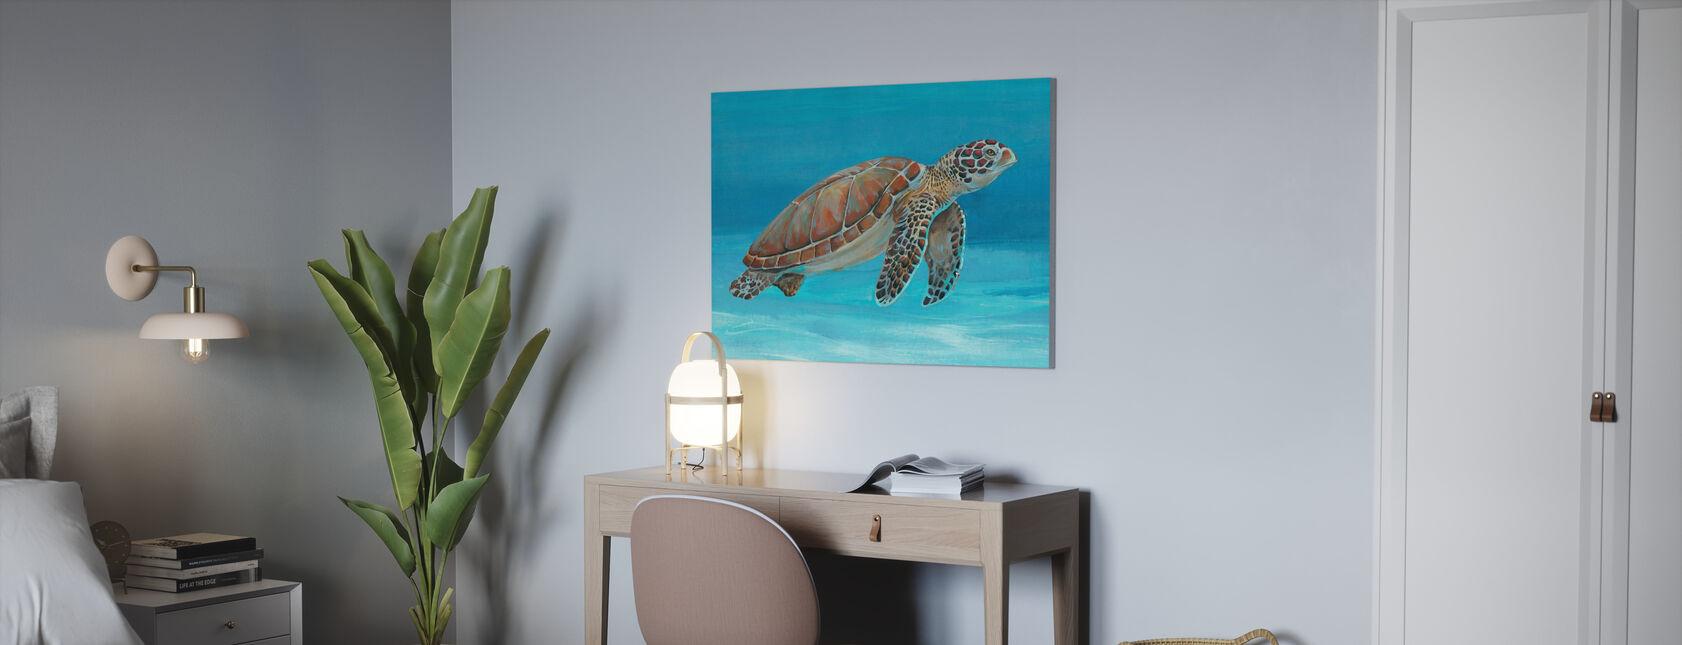 Ocean Sea Turtle - Canvas print - Office